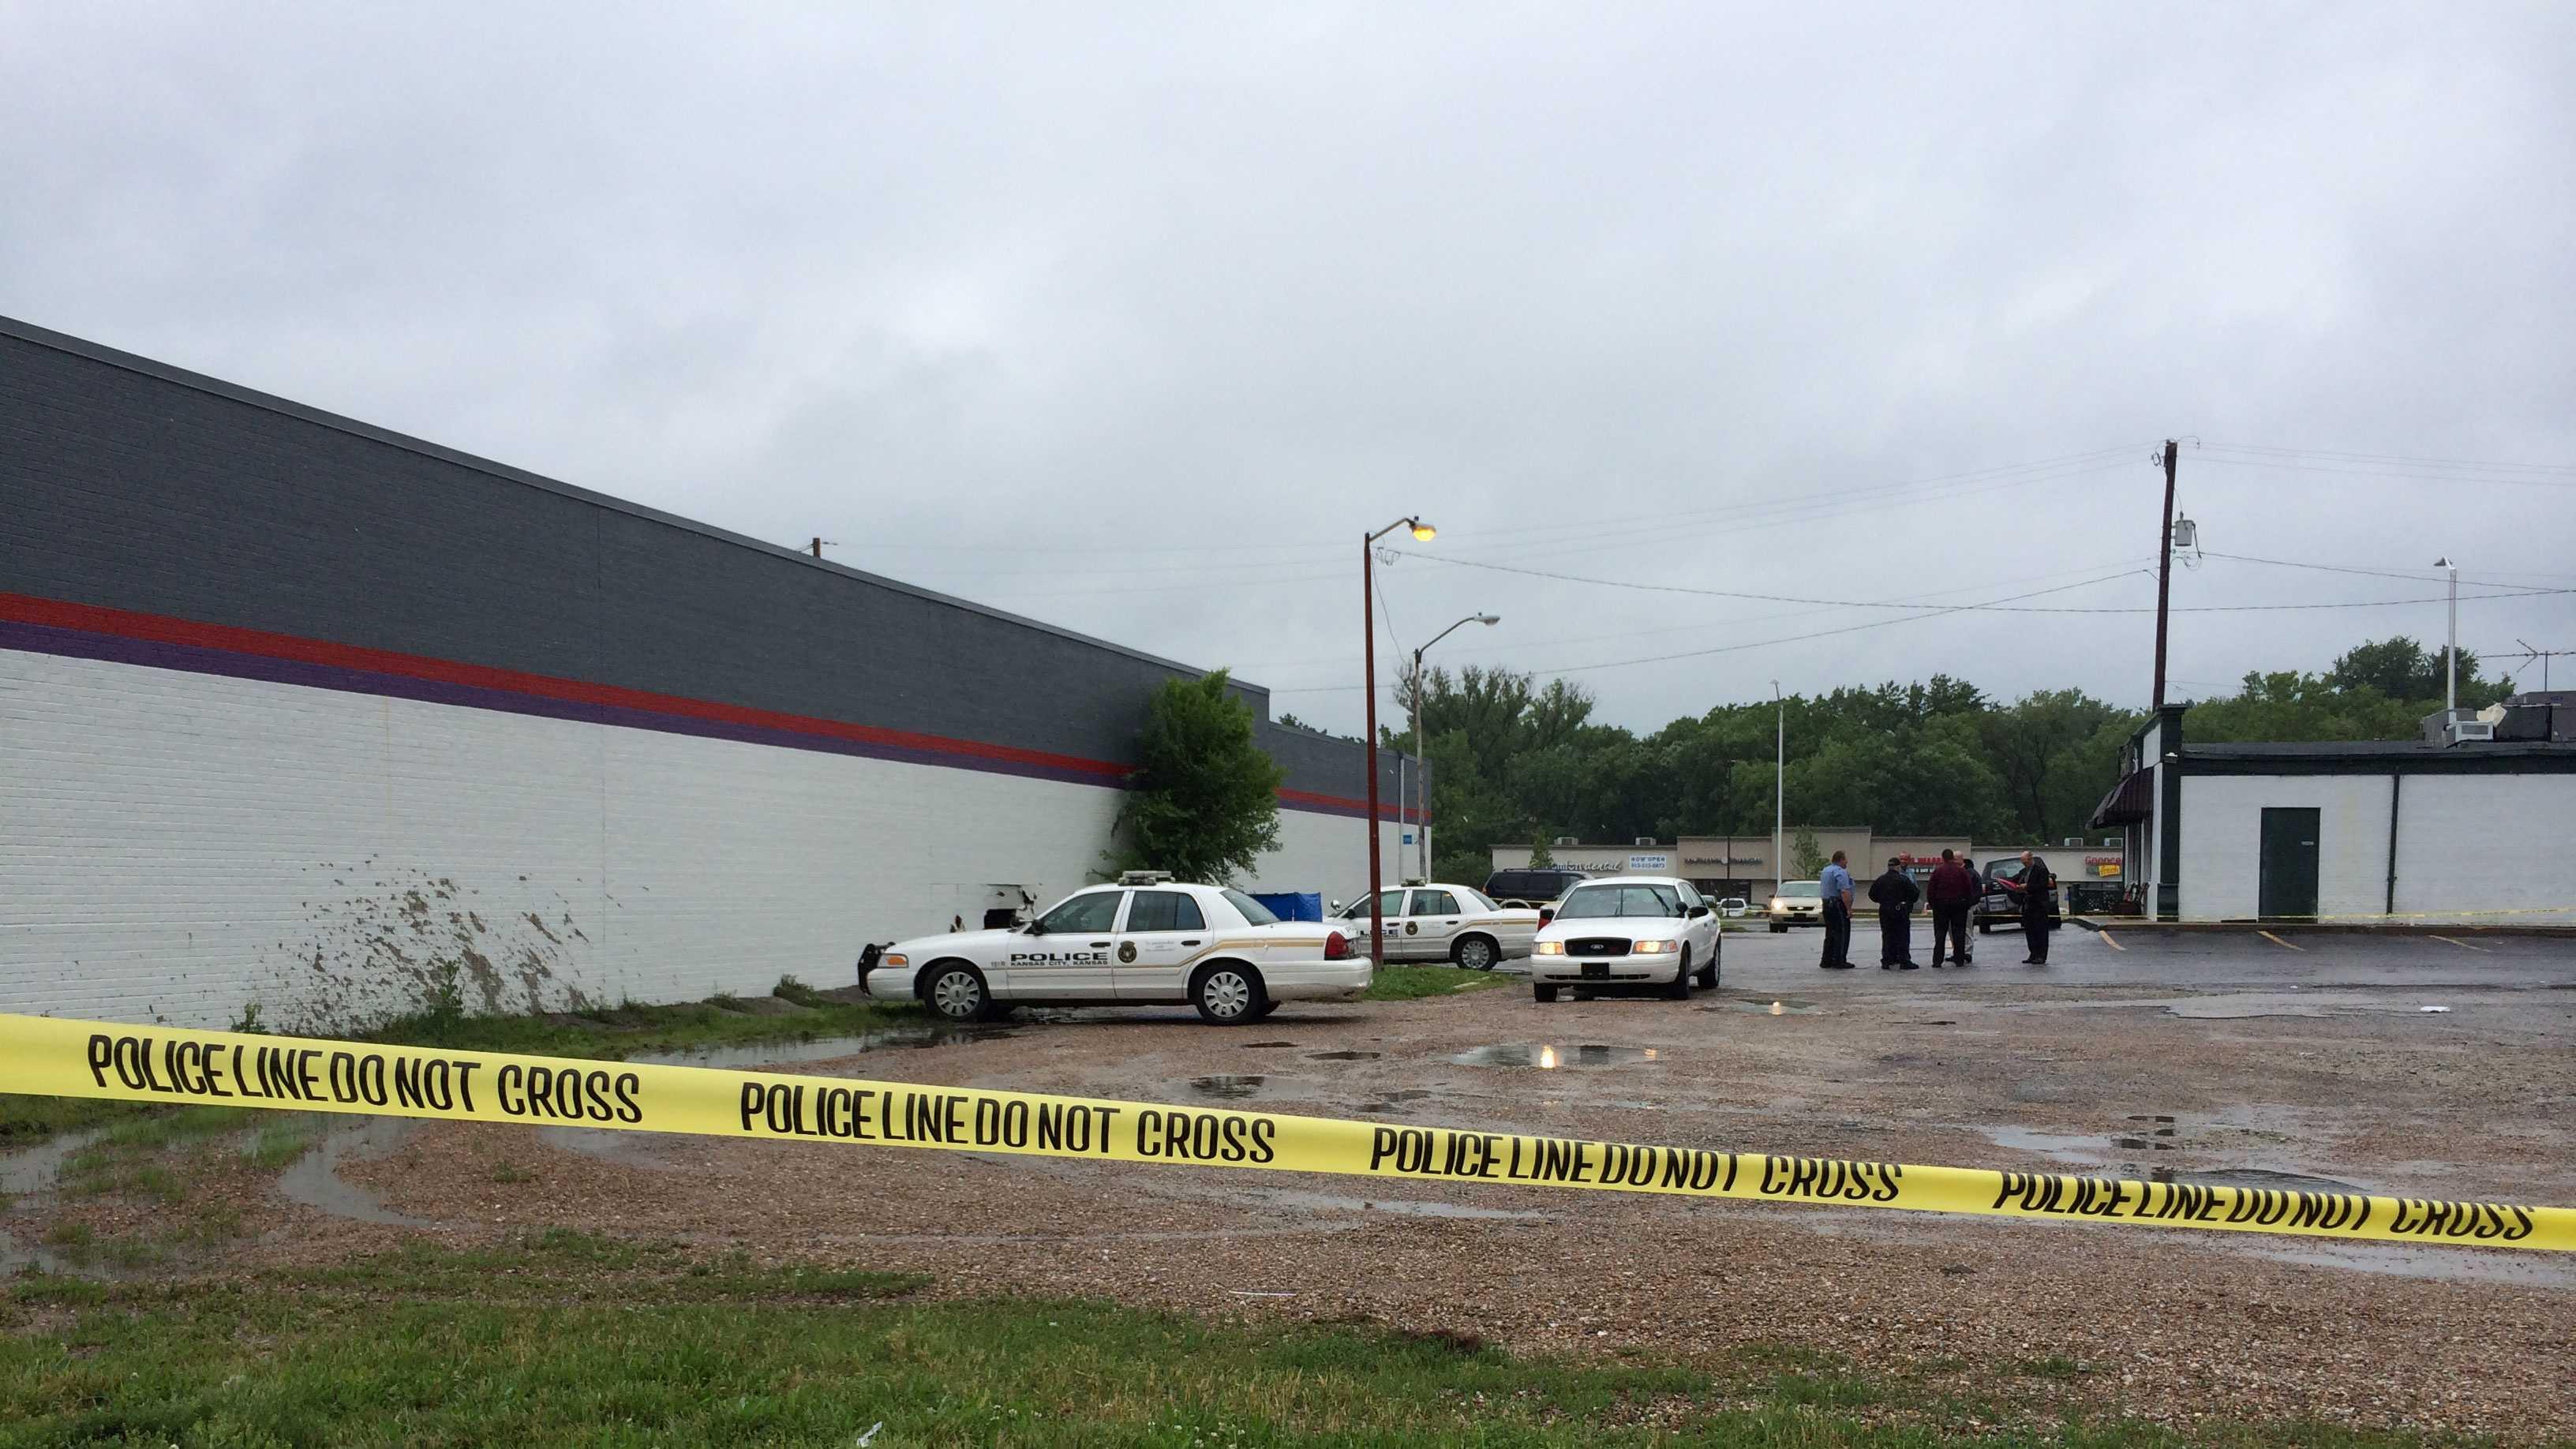 Calvert's Auto Express, homicide